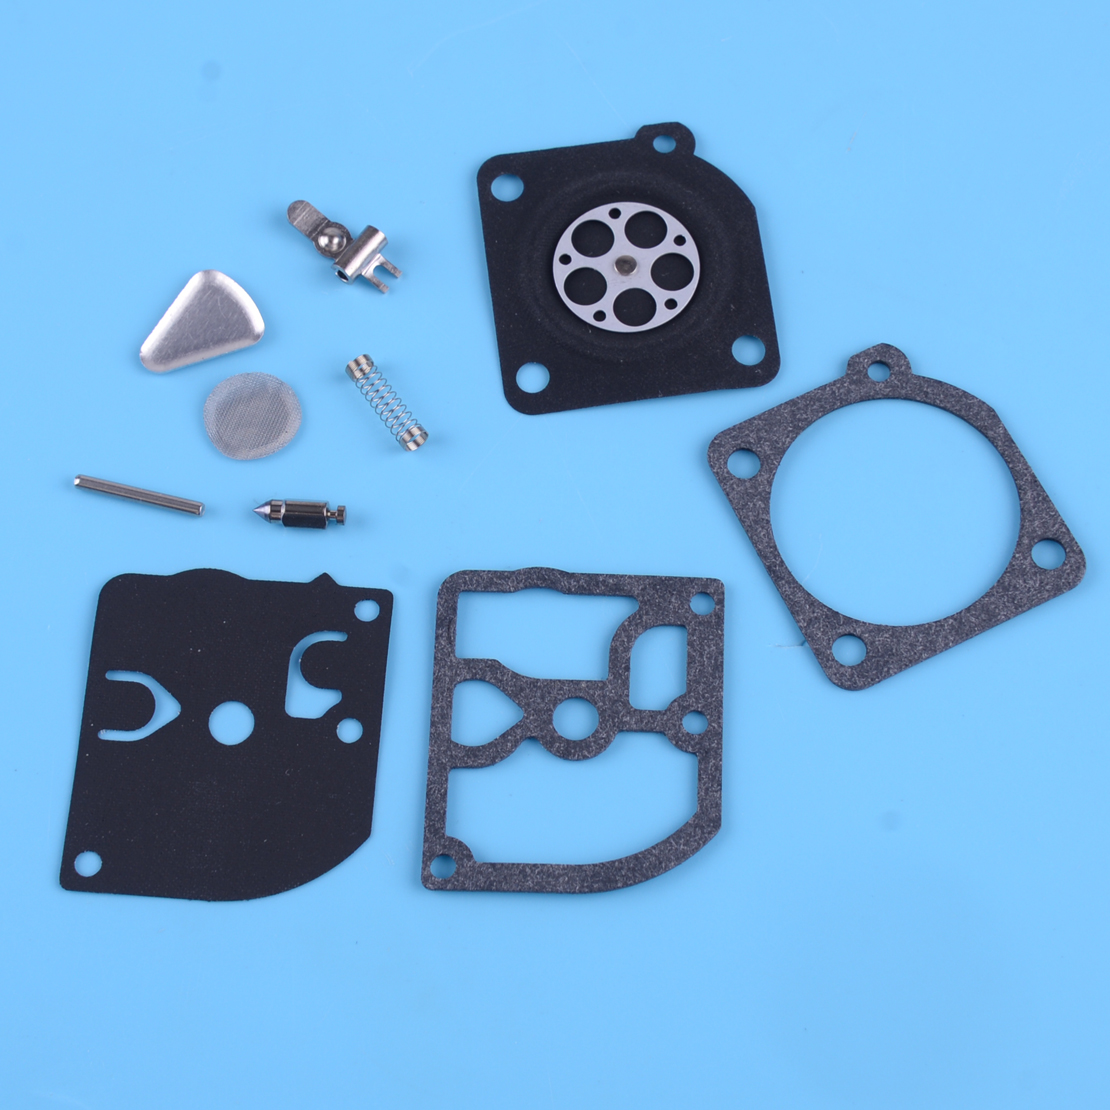 LETAOSK Carburetor Carb Repair Kit Fit For ZAMA RB-45 C1Q EL1 EL10 PARTNER 400 410 Jonsered 2041 2045 Husqvarna Chainsaws 45